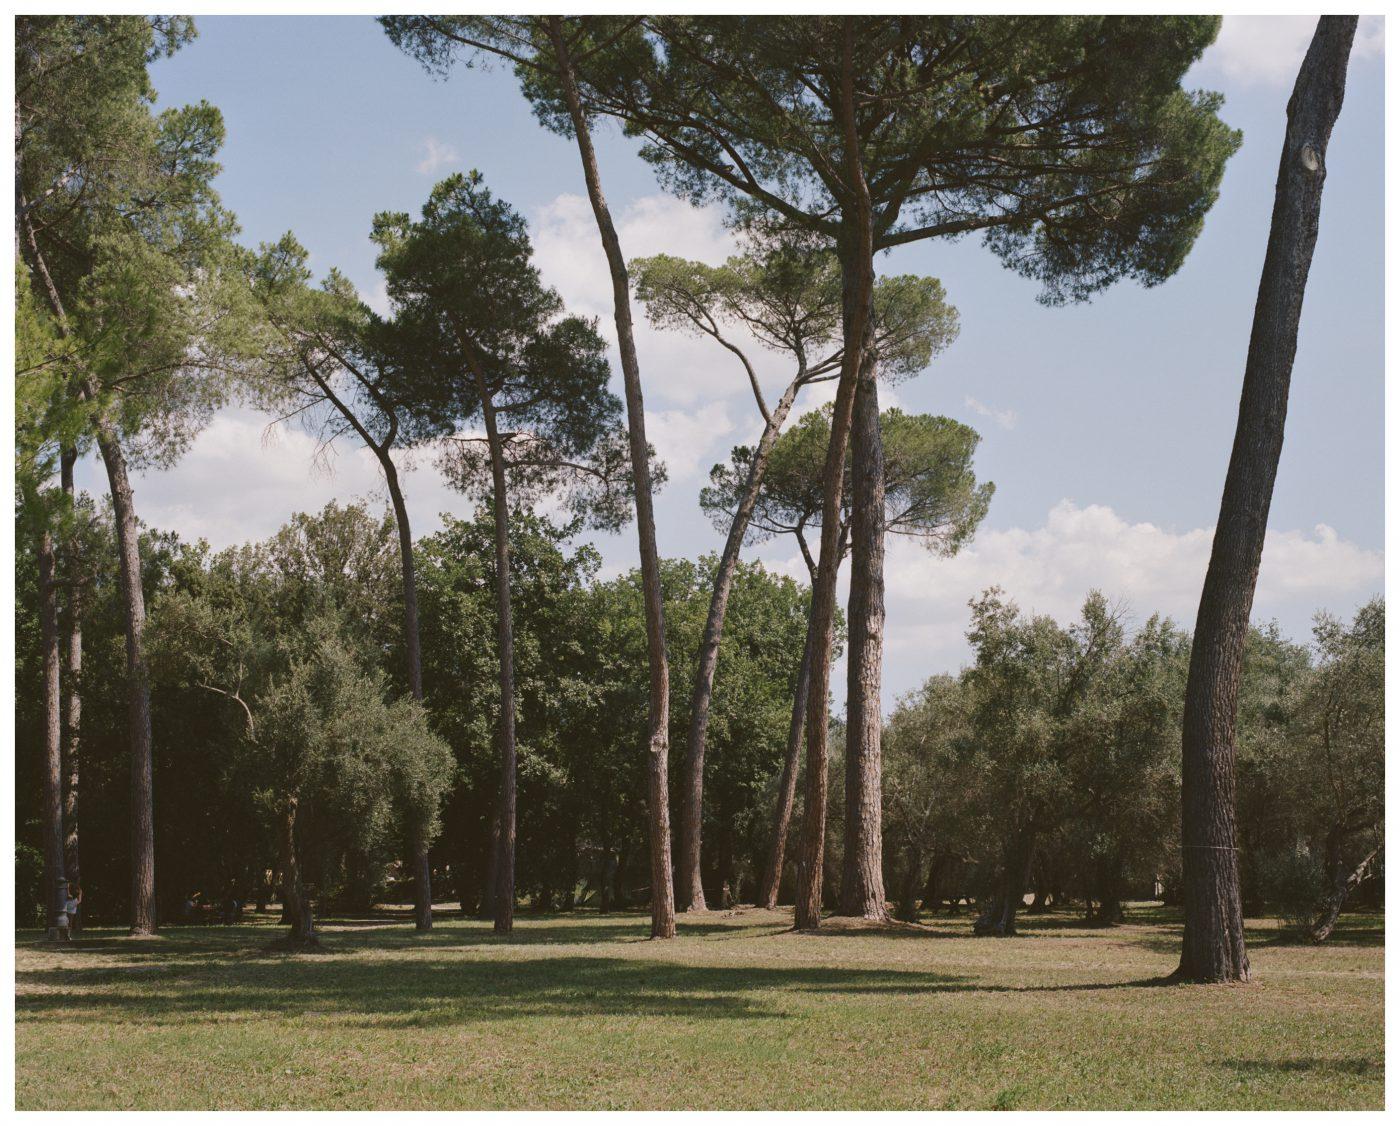 Roman Photographer Fabrizio Amoroso Tivoli, Villa Adriana, 2019